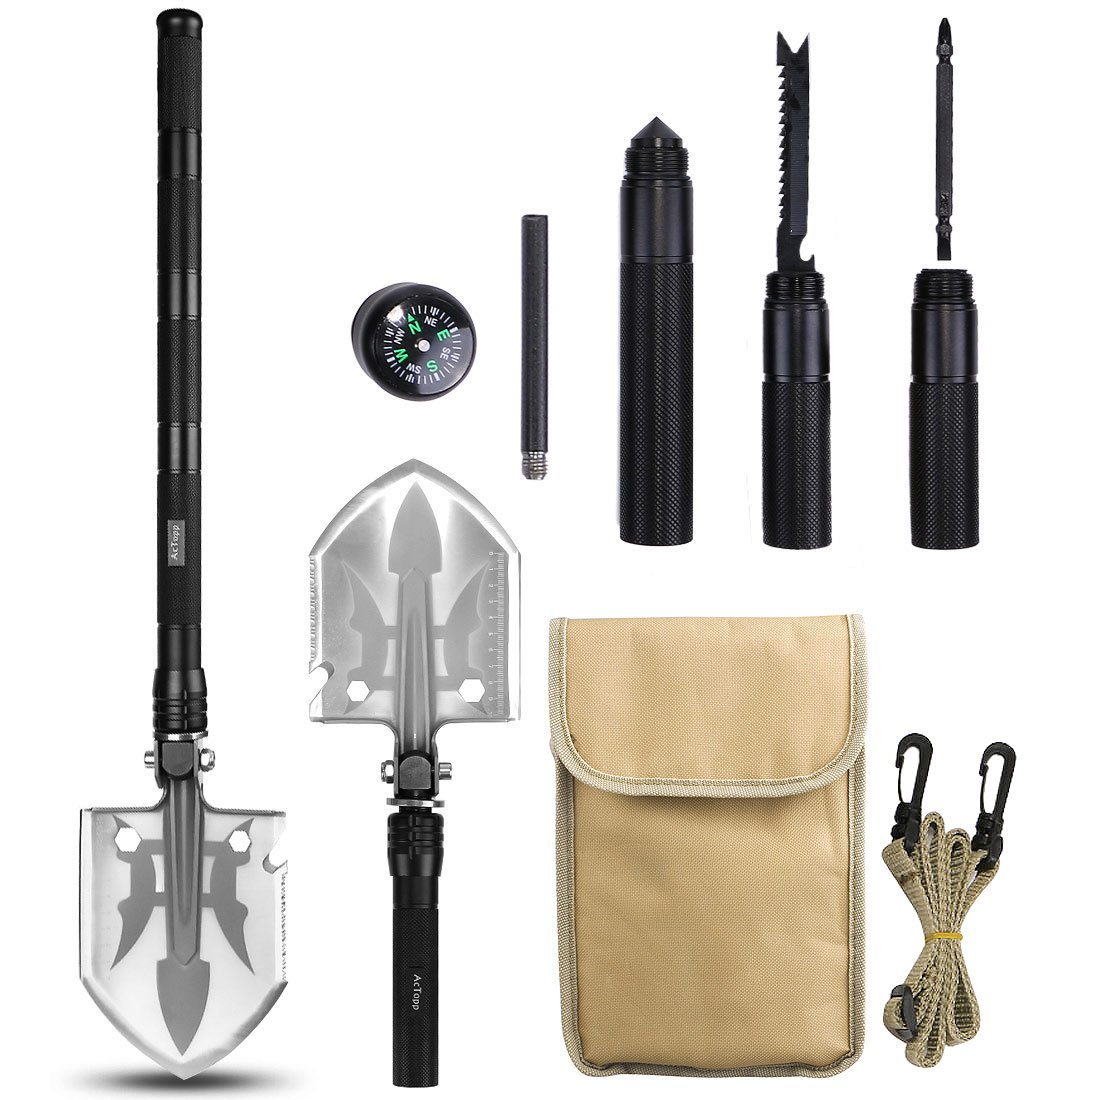 Schaufeln Camping & Outdoor Tactical  Schaufel mit Tasche Outdoor Schaufel Paracord Spaten Neu